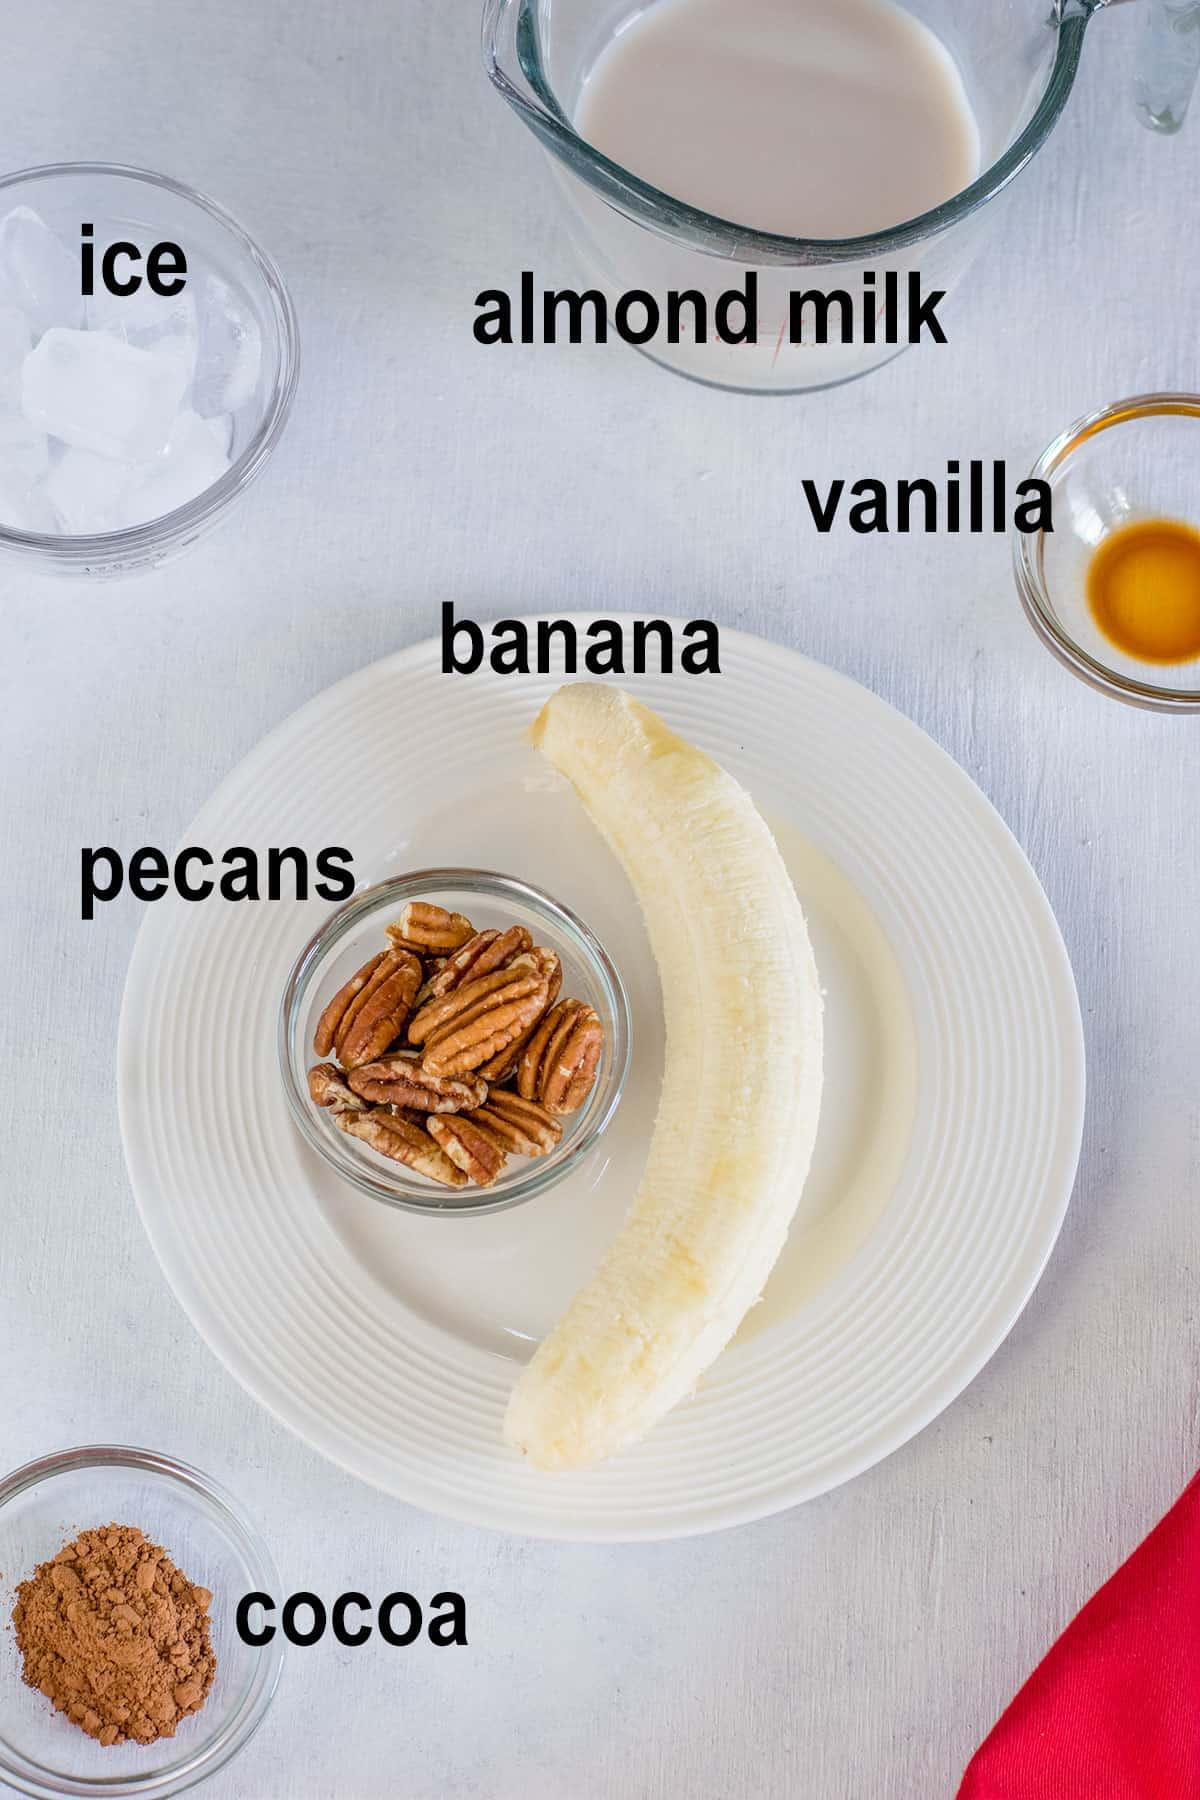 banana, pecans, almond milk, cocoa, vanilla, ice